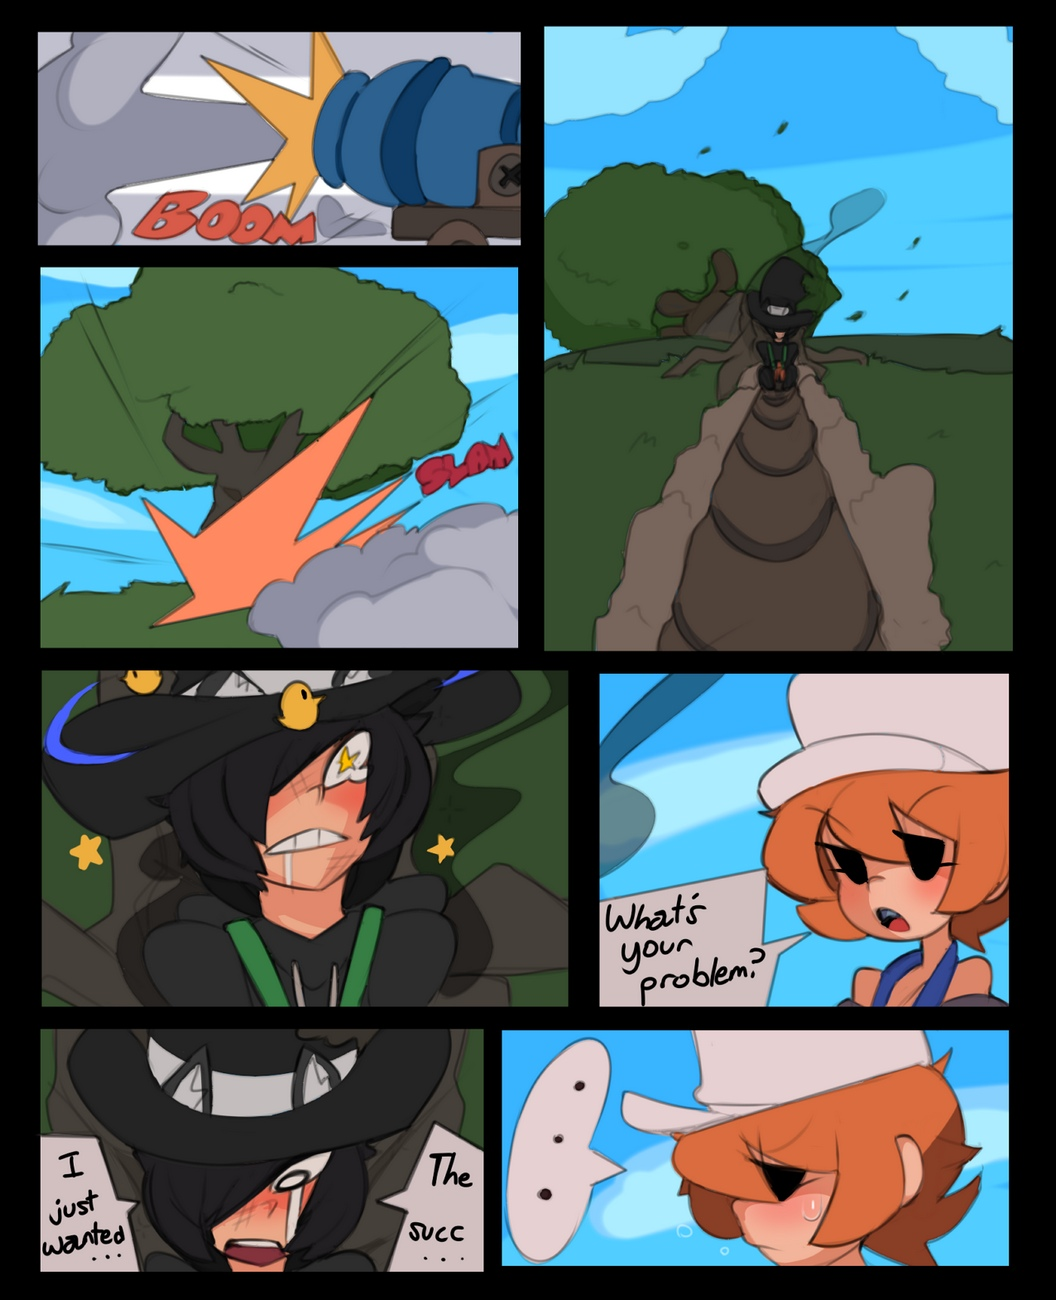 3-Lil-Peas 9 free sex comic